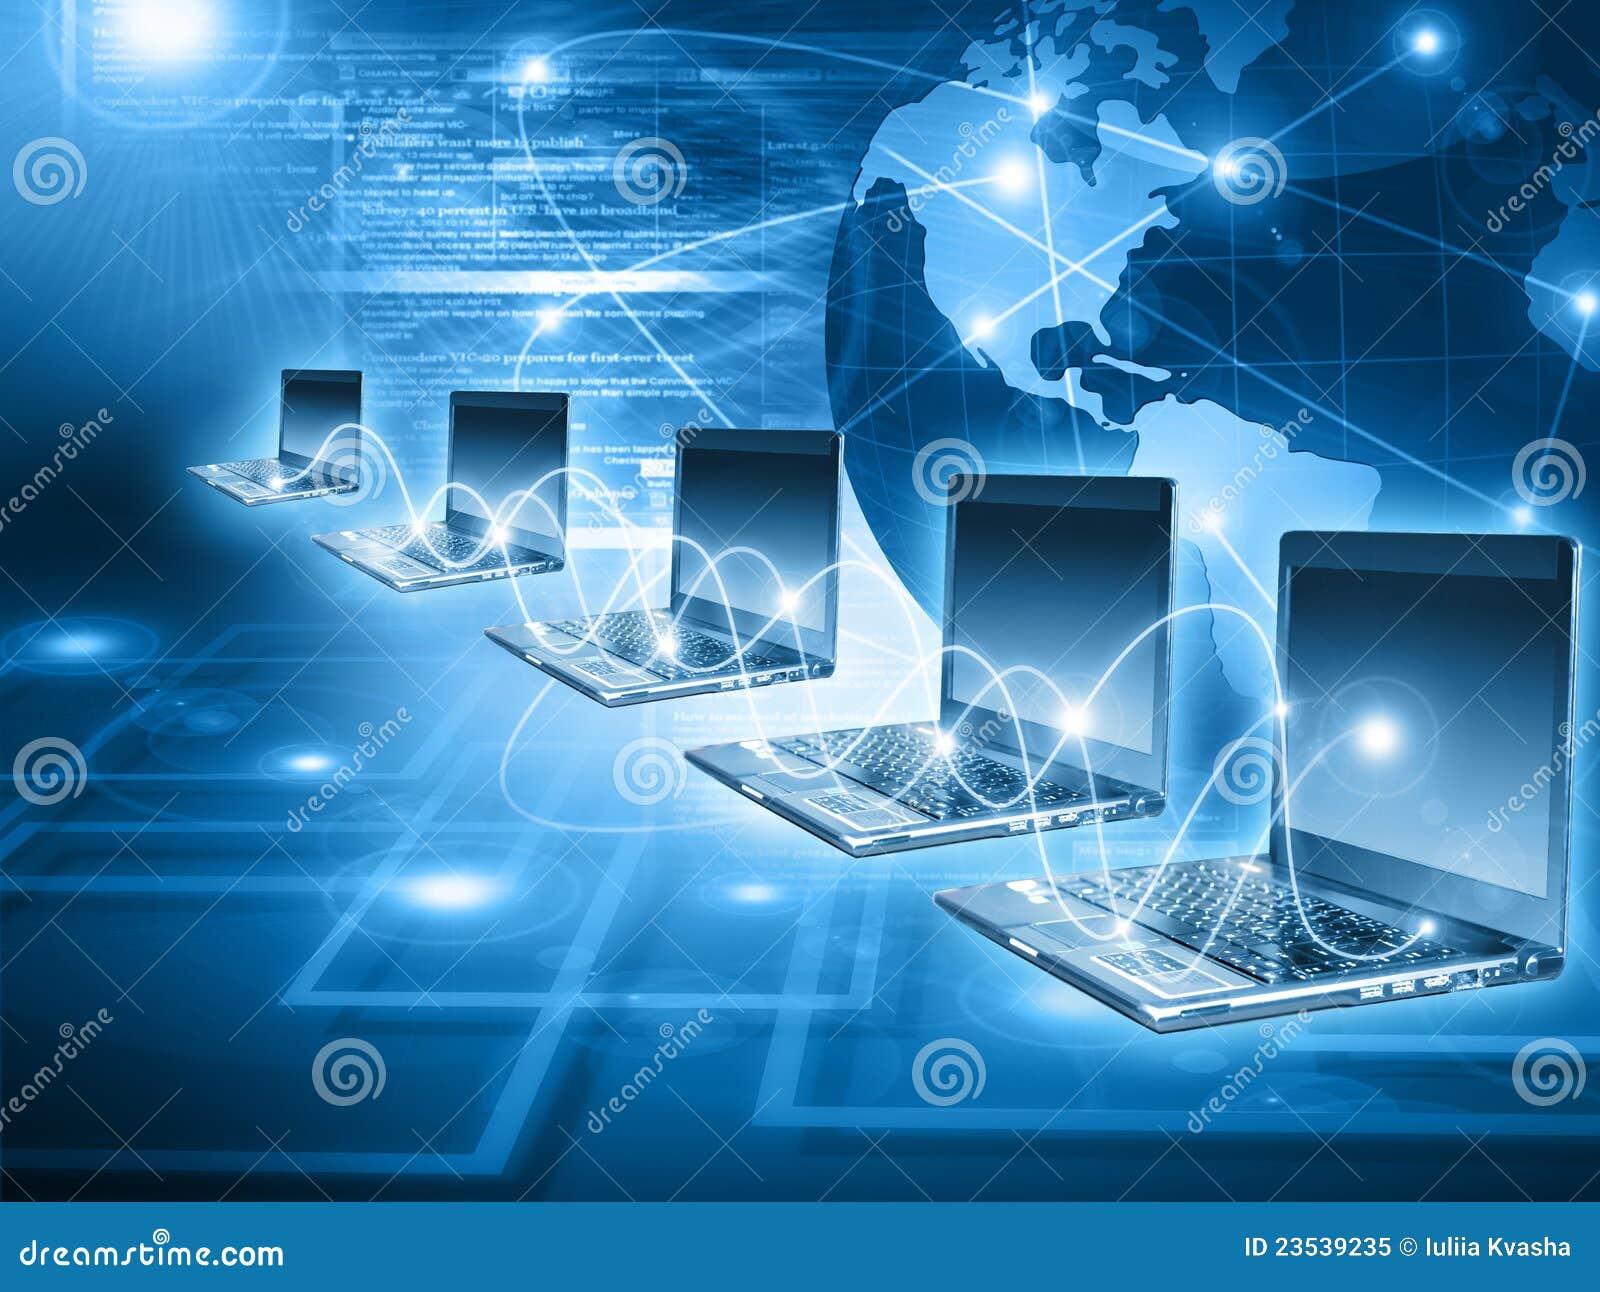 Worldwide computer connectivity